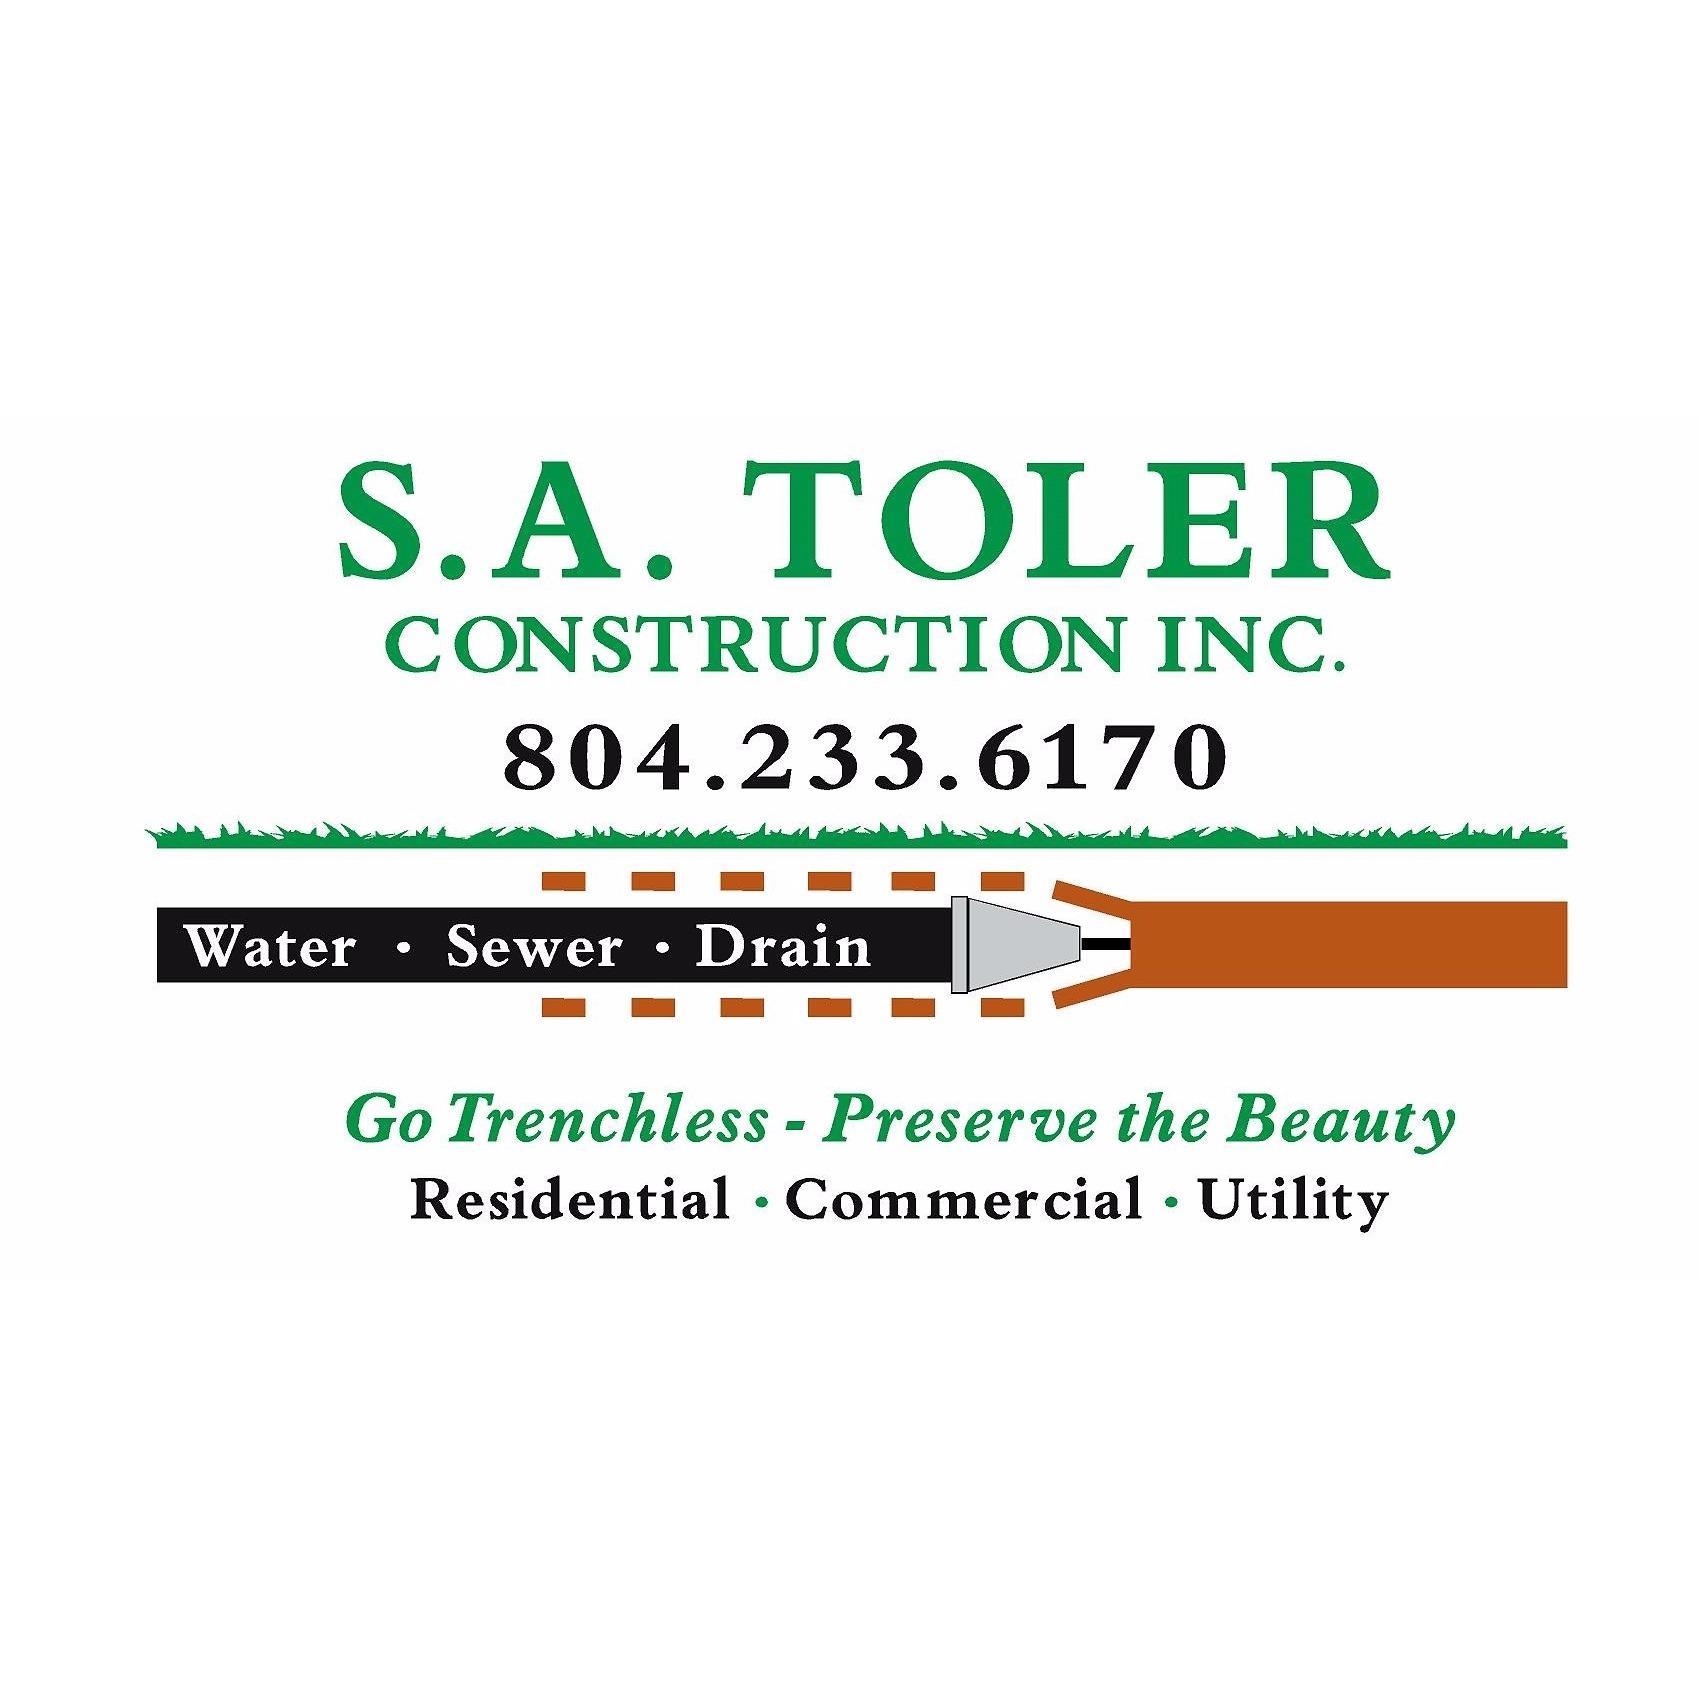 S.A. Toler Construction Inc image 4